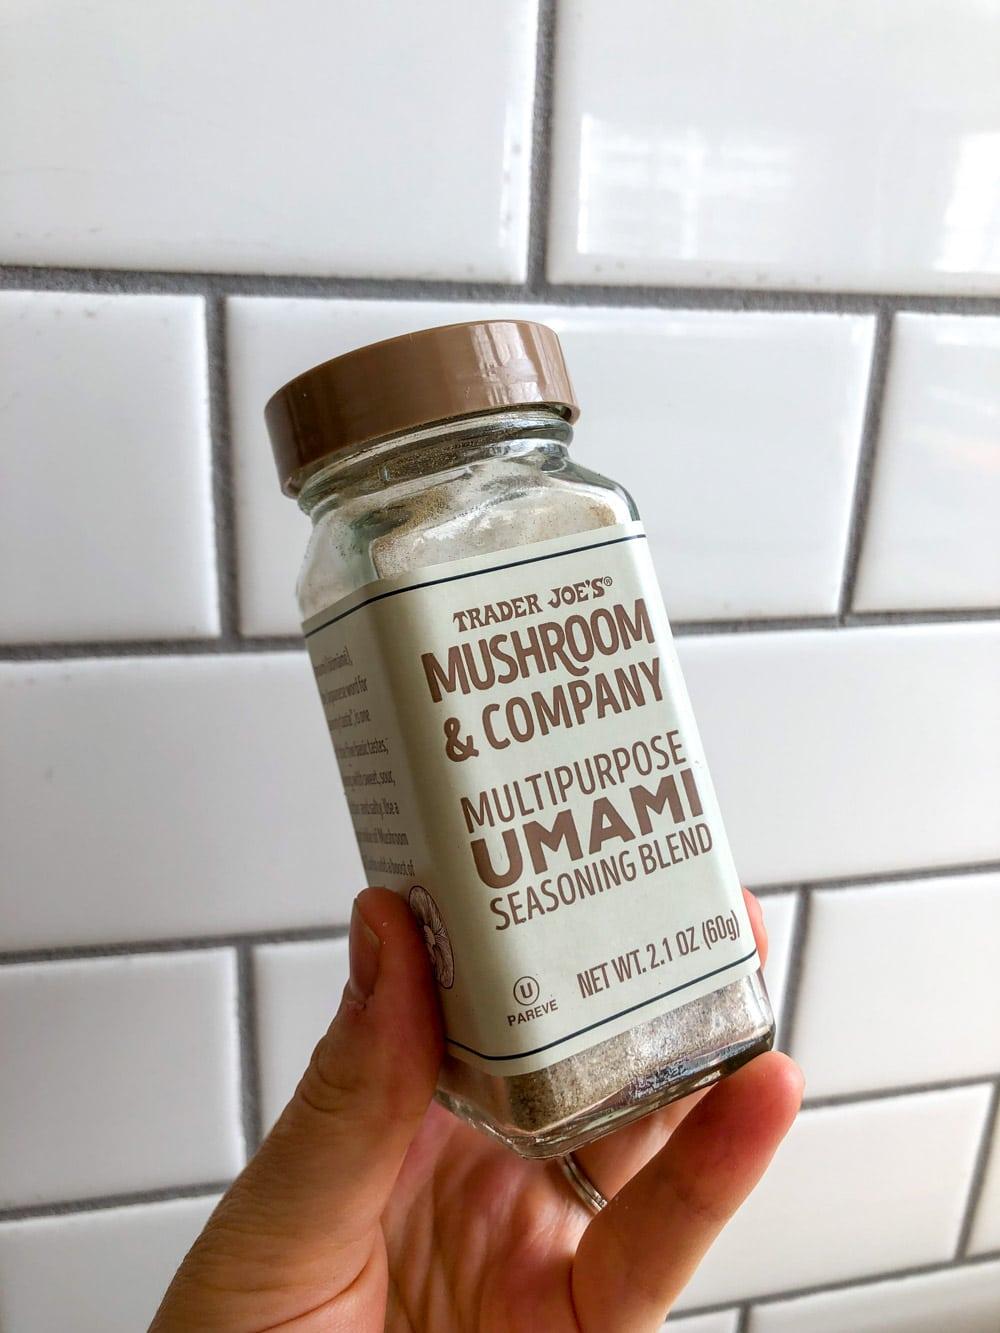 A jar of umami seasoning blend.